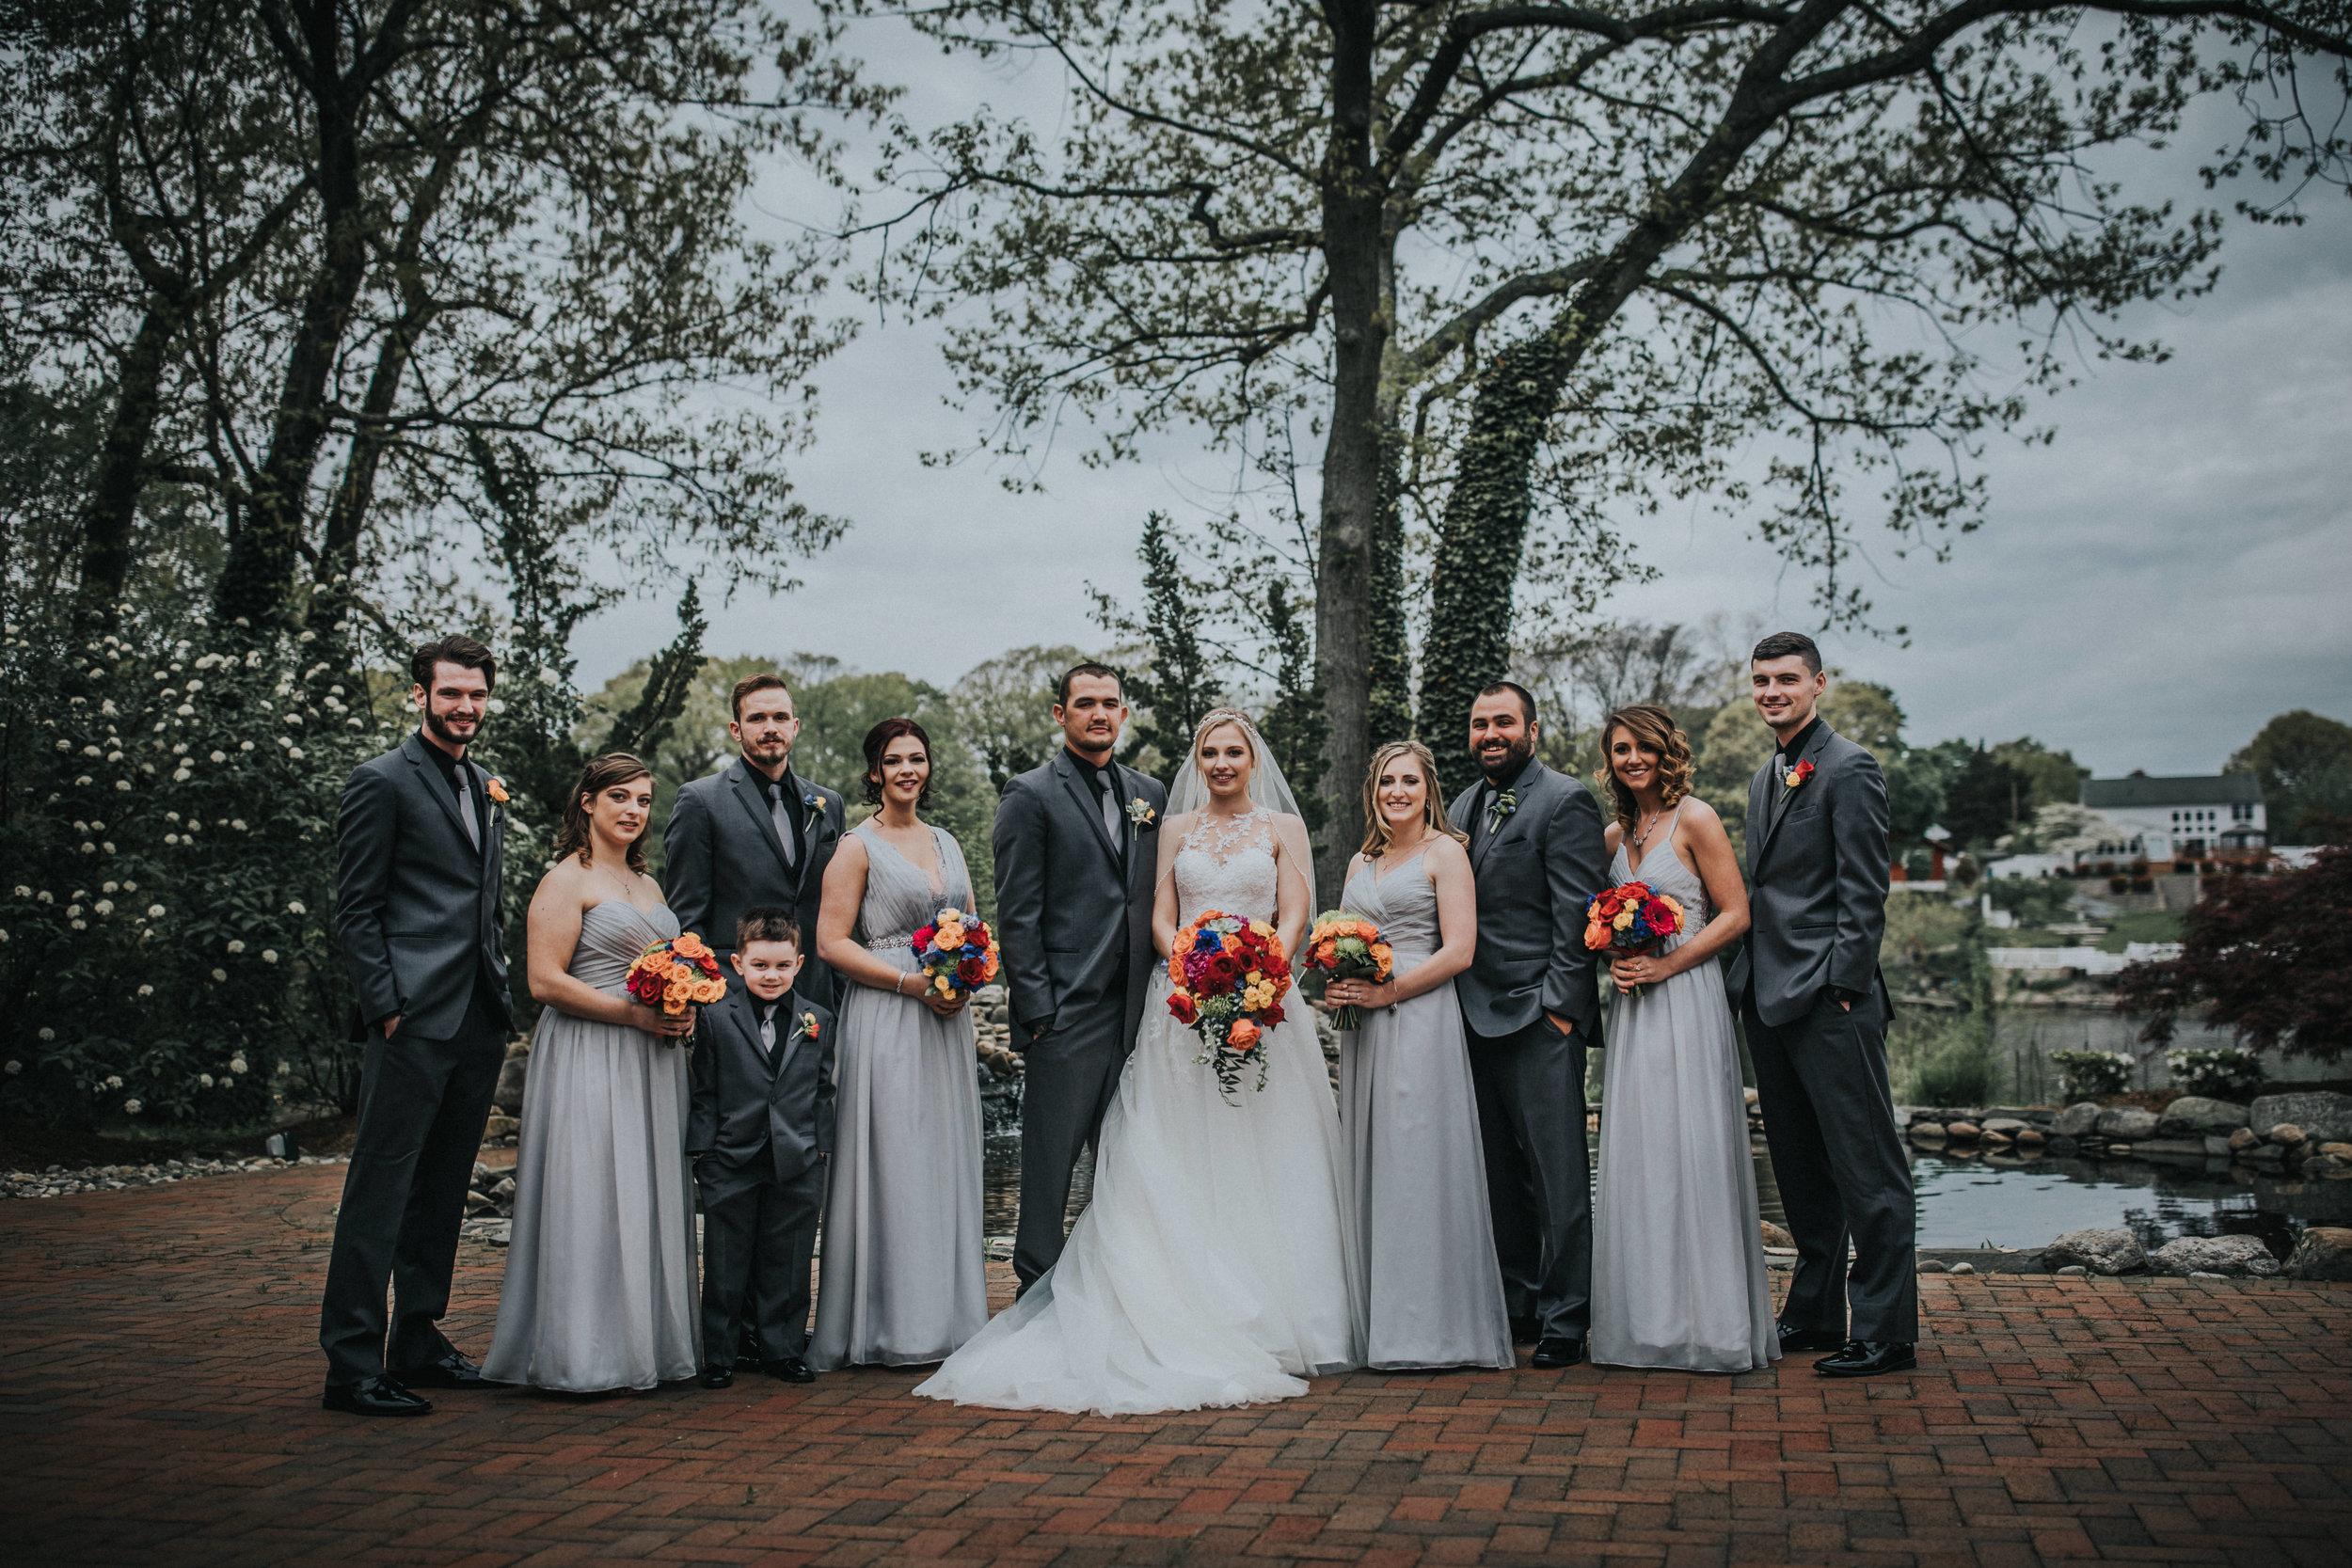 New-Jersey-Wedding-Photographer-Megan&Nick-BridalParty-1.jpg